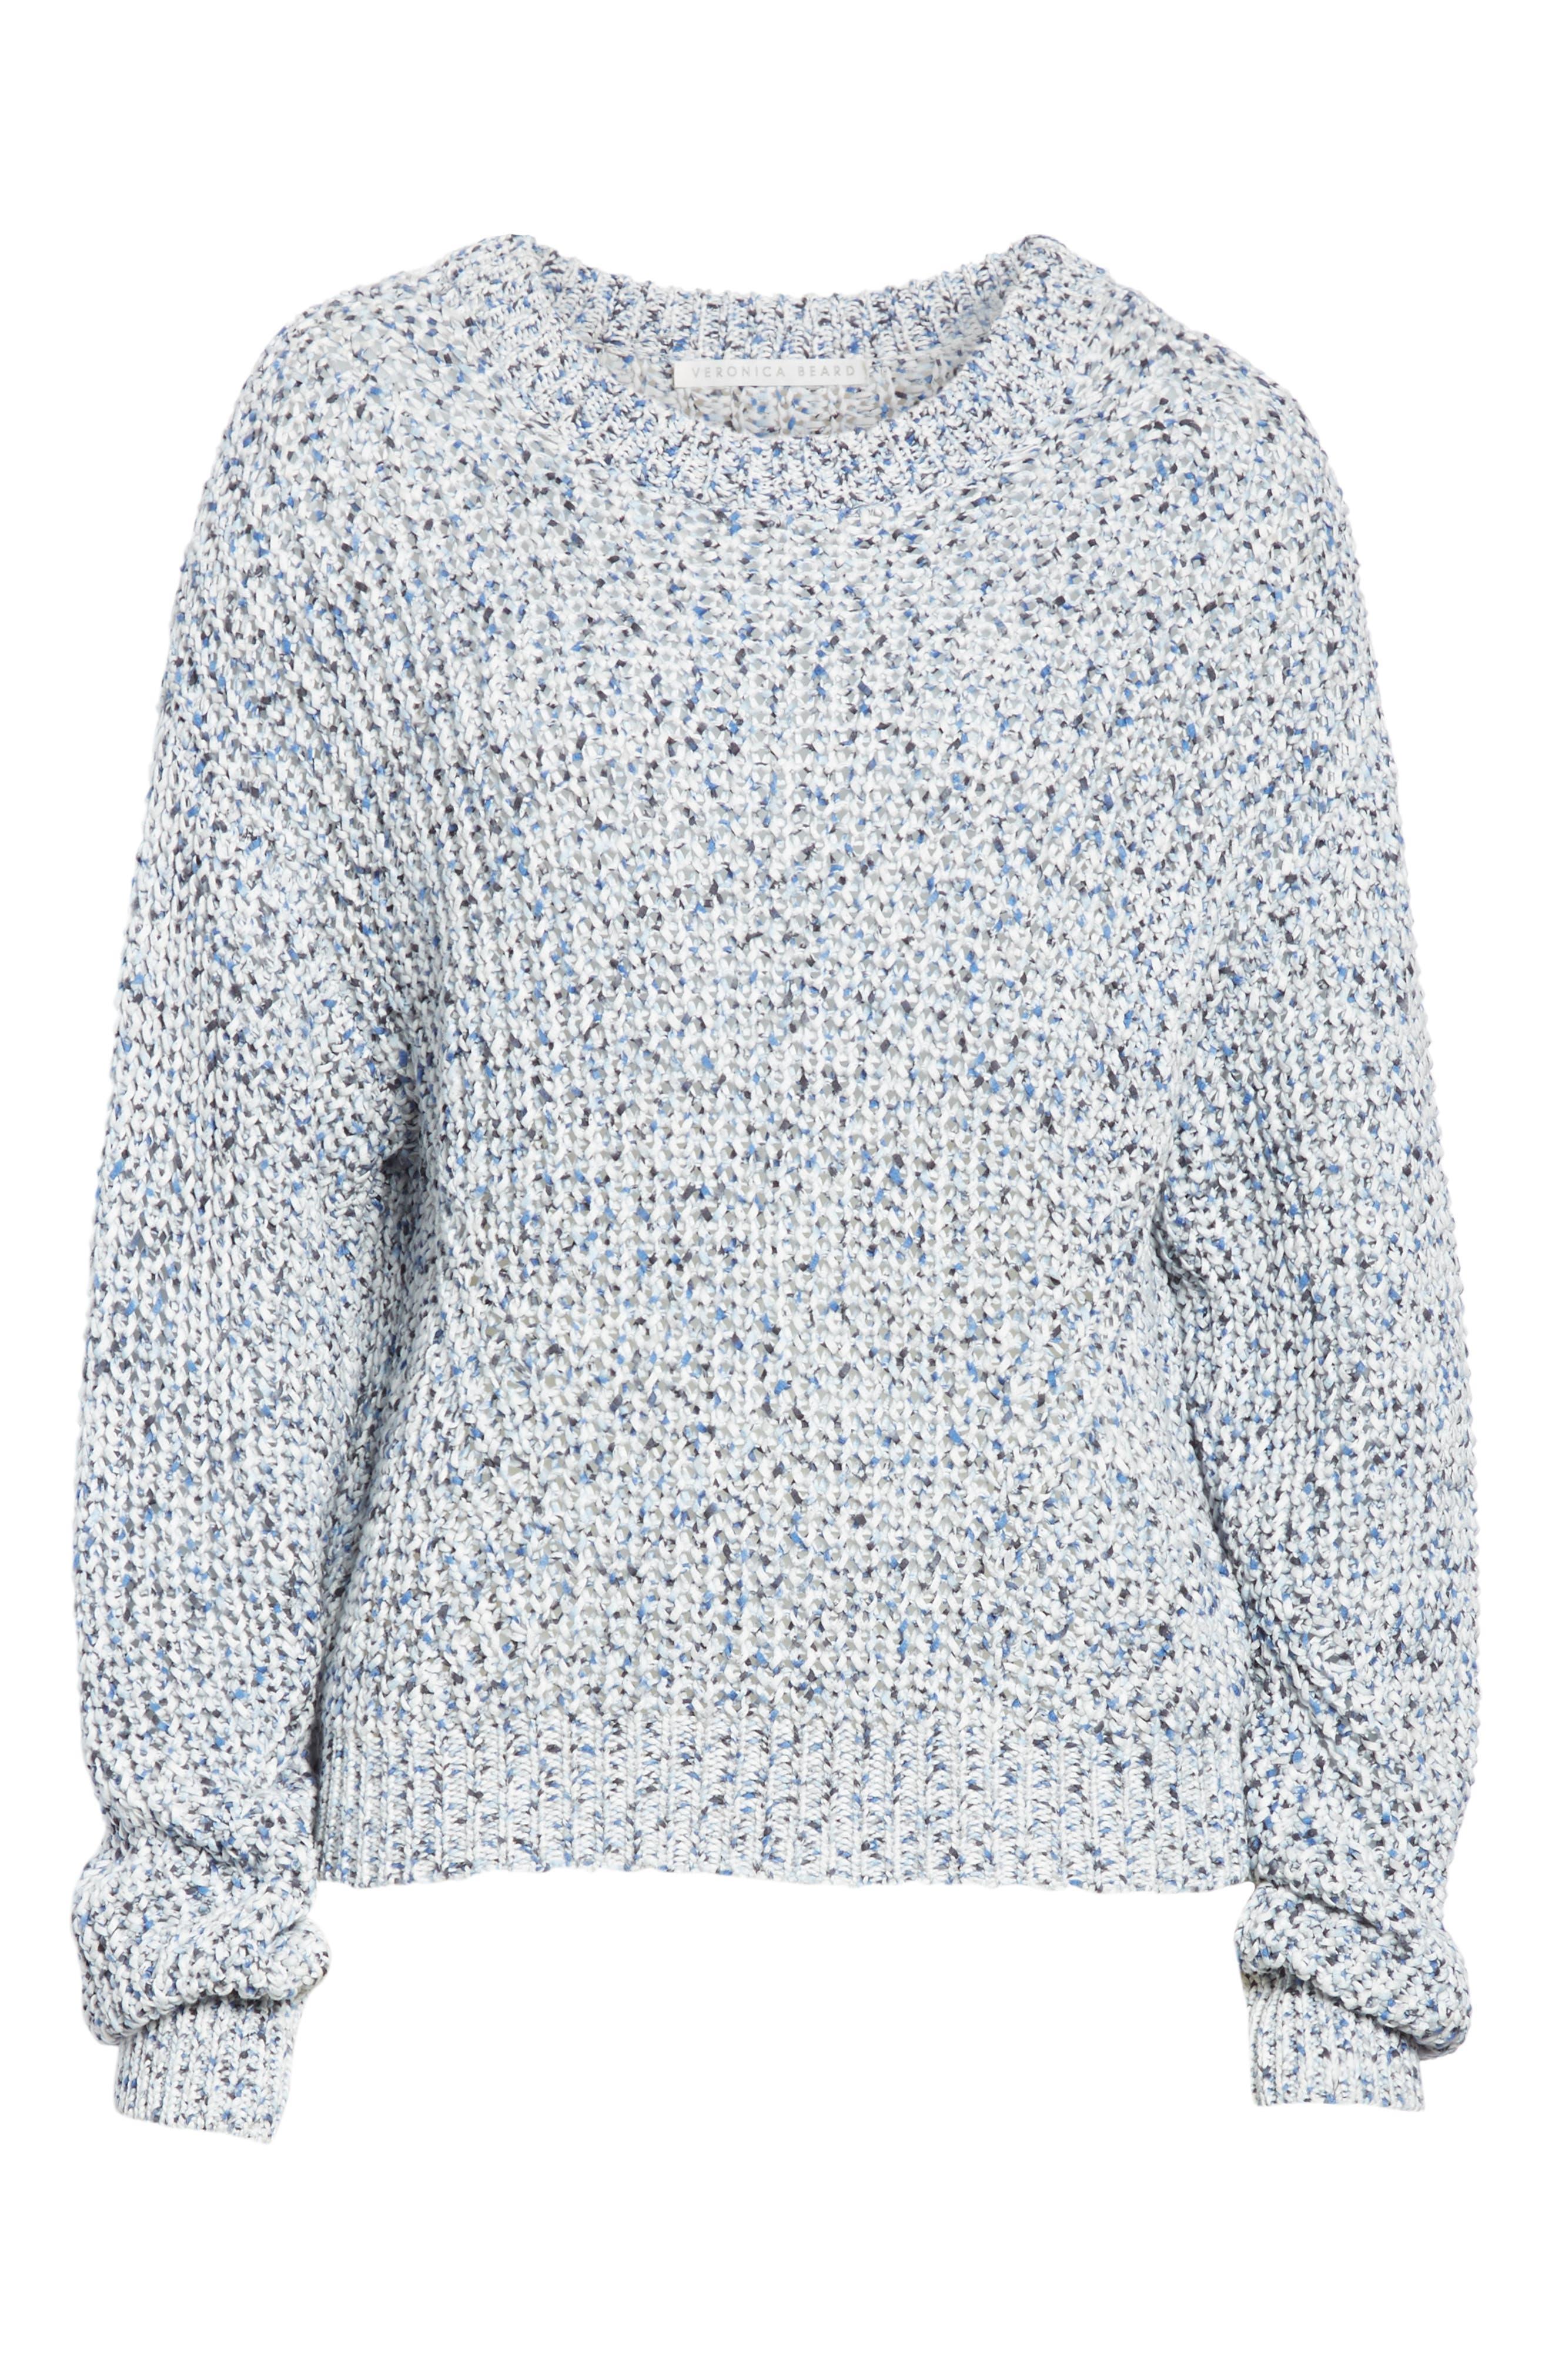 Ryce Cotton Sweater,                             Alternate thumbnail 6, color,                             BLUE MULIT